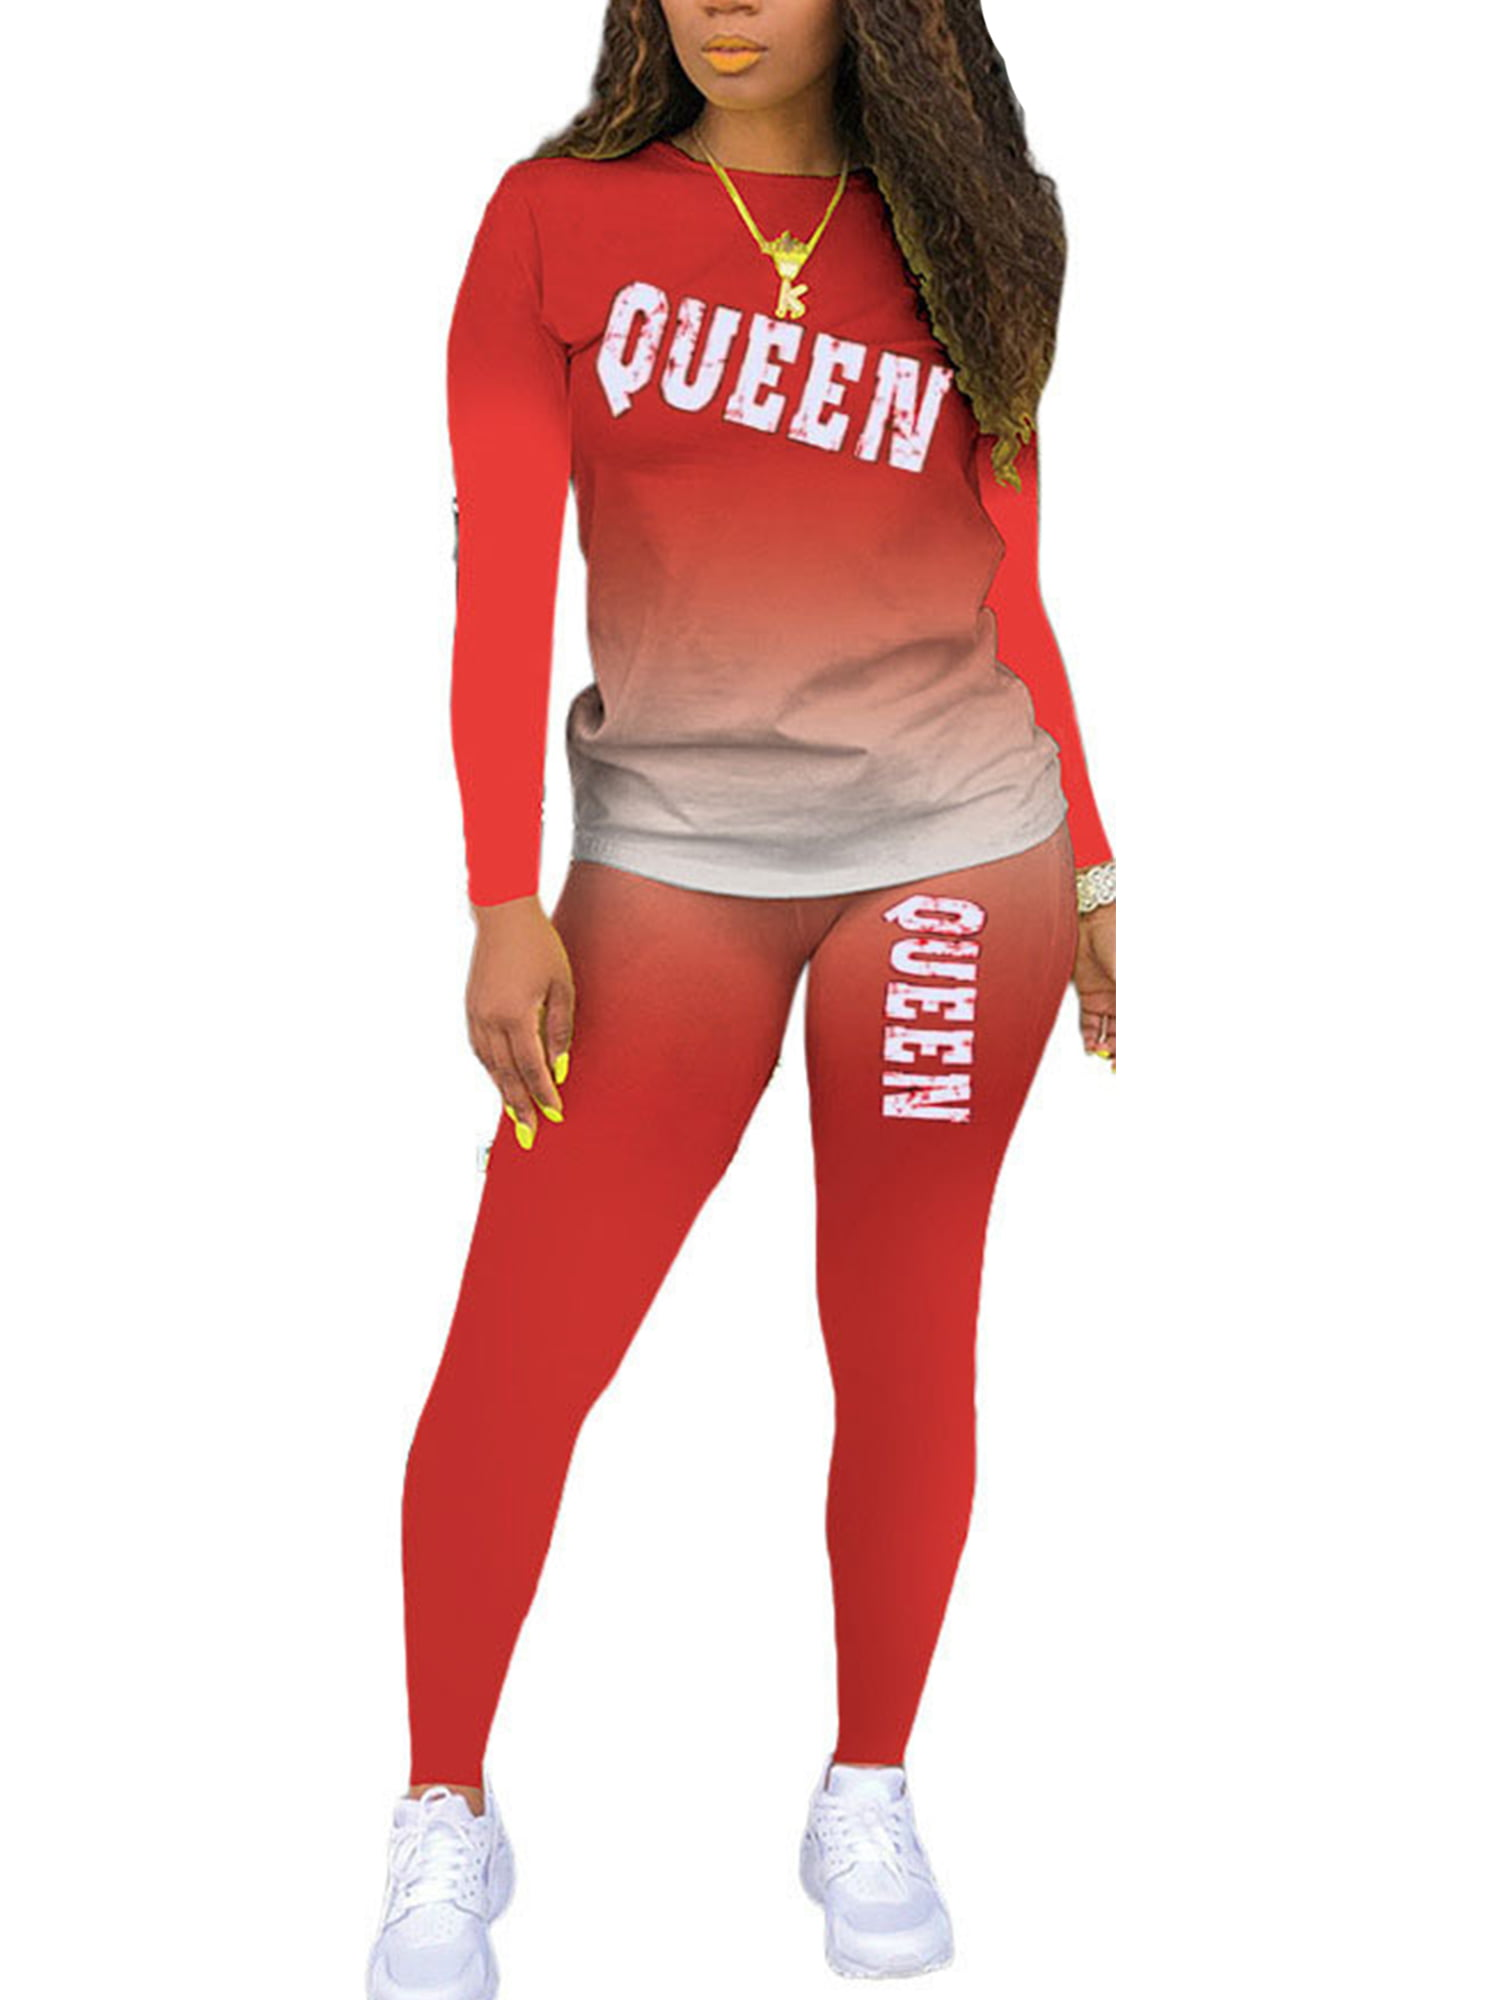 Pink Queen Women 2 Piece Tie Dye Sweatsuit Set Long Sleeve Pullover and Short Joggers Pants Sets